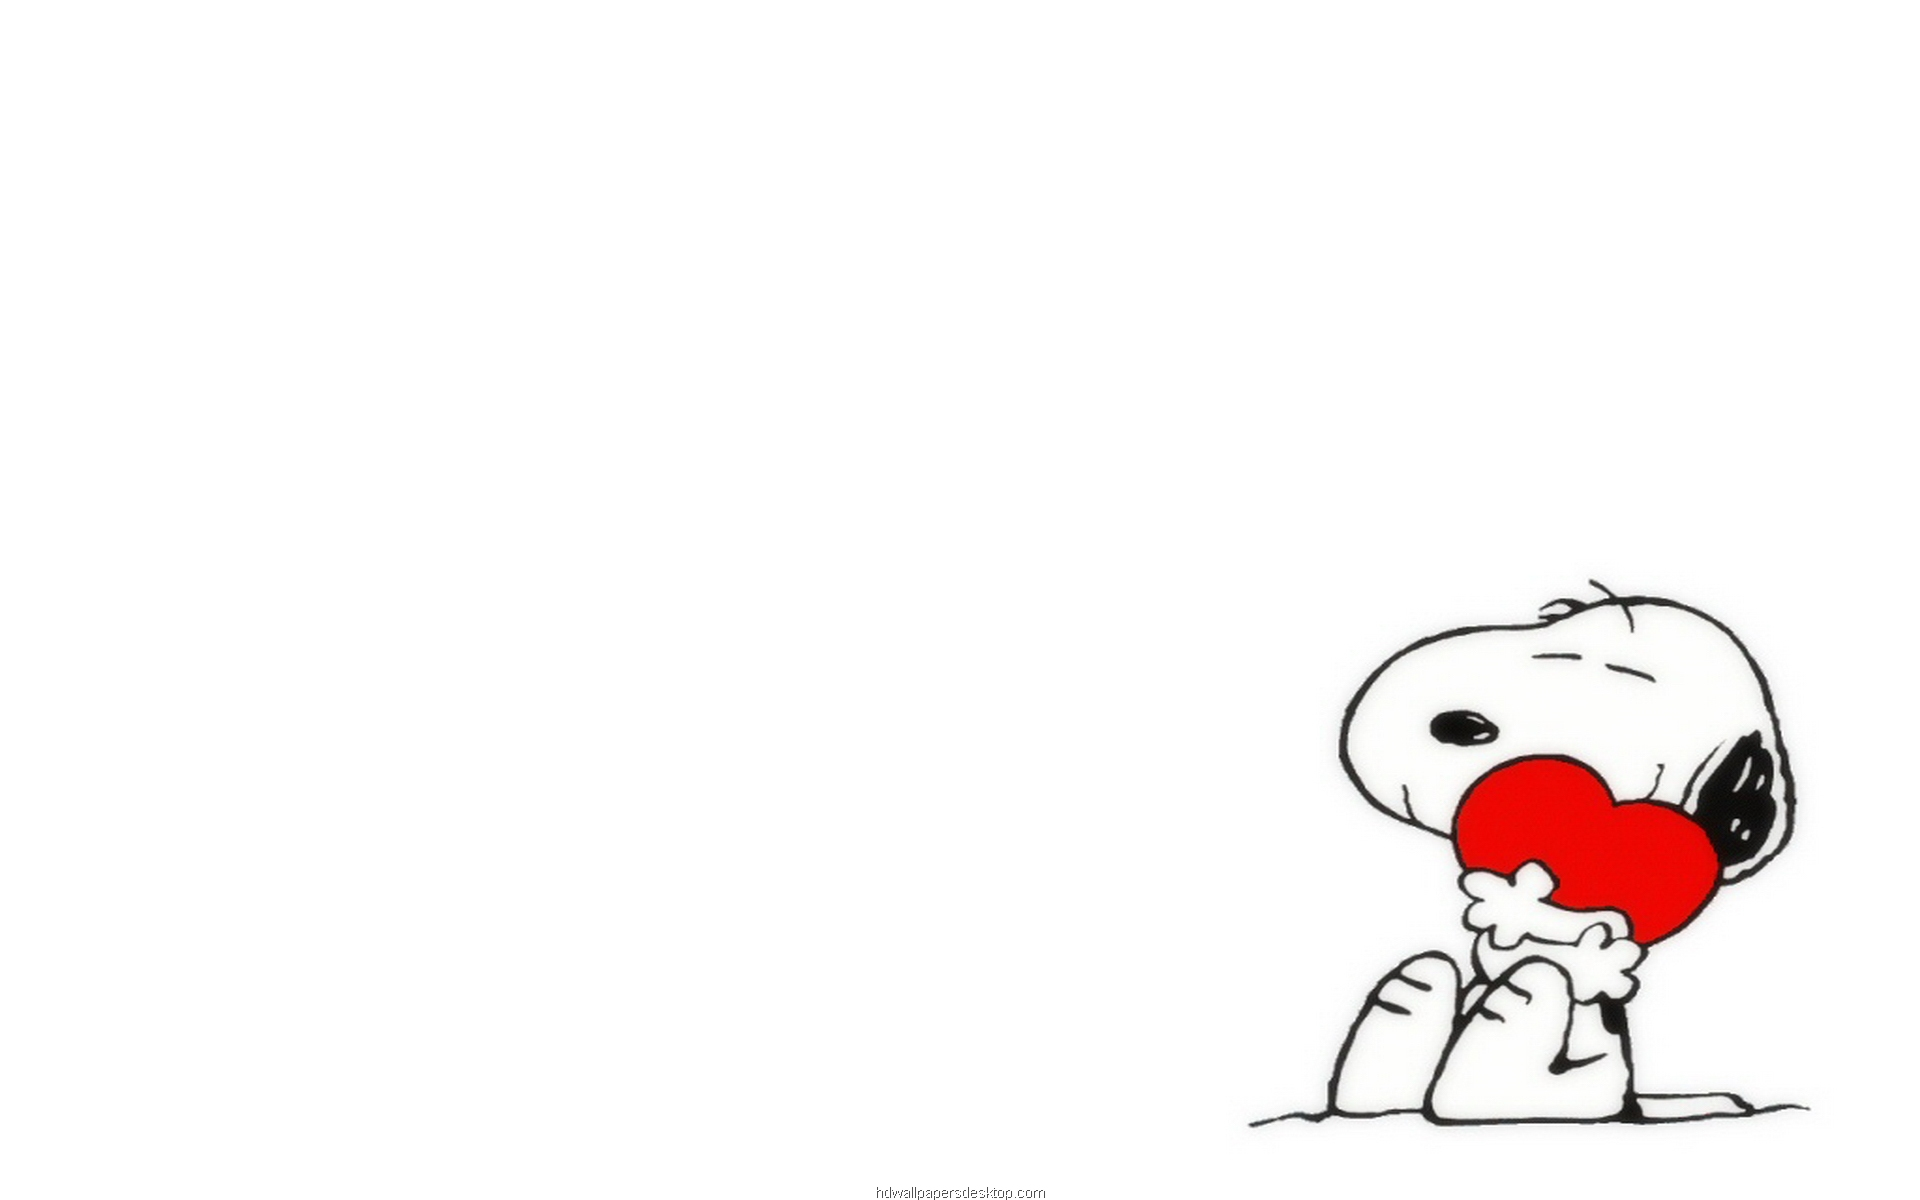 49 Free Snoopy Wallpapers For Desktop On Wallpapersafari